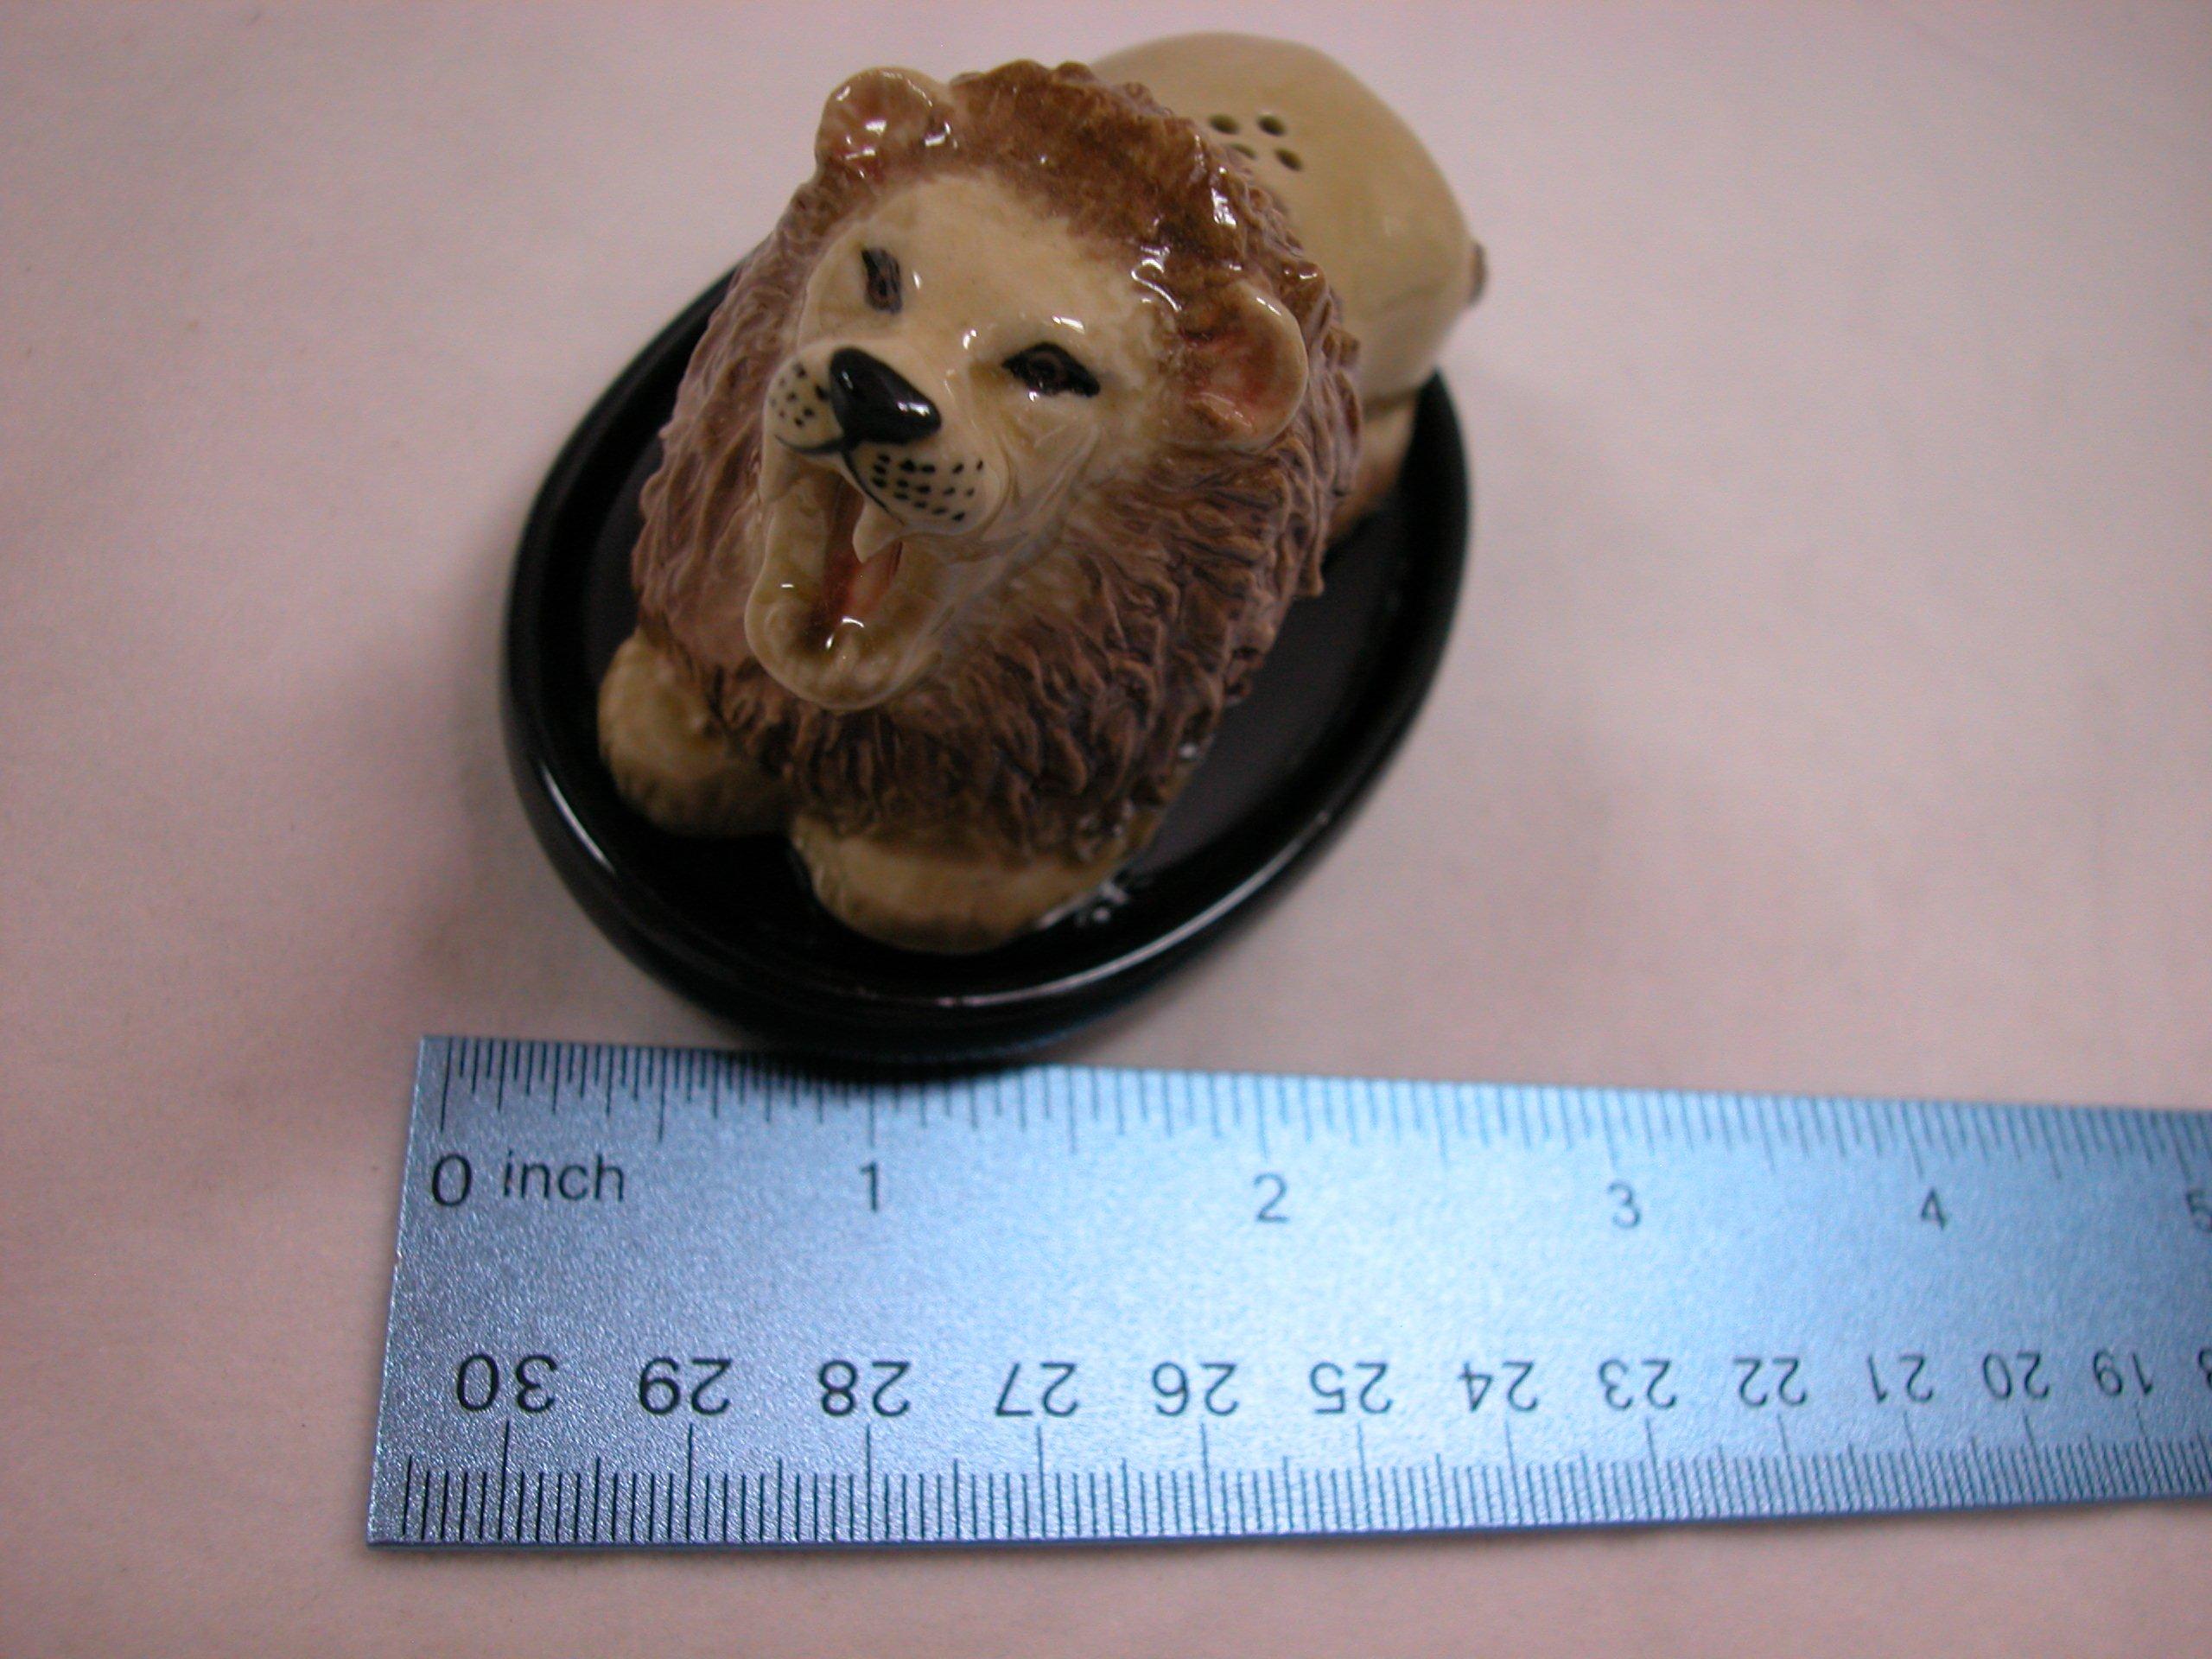 Animal Tracks Miniature Porcelain Animal Lion Salt & Pepper Shaker Set #SAP1104